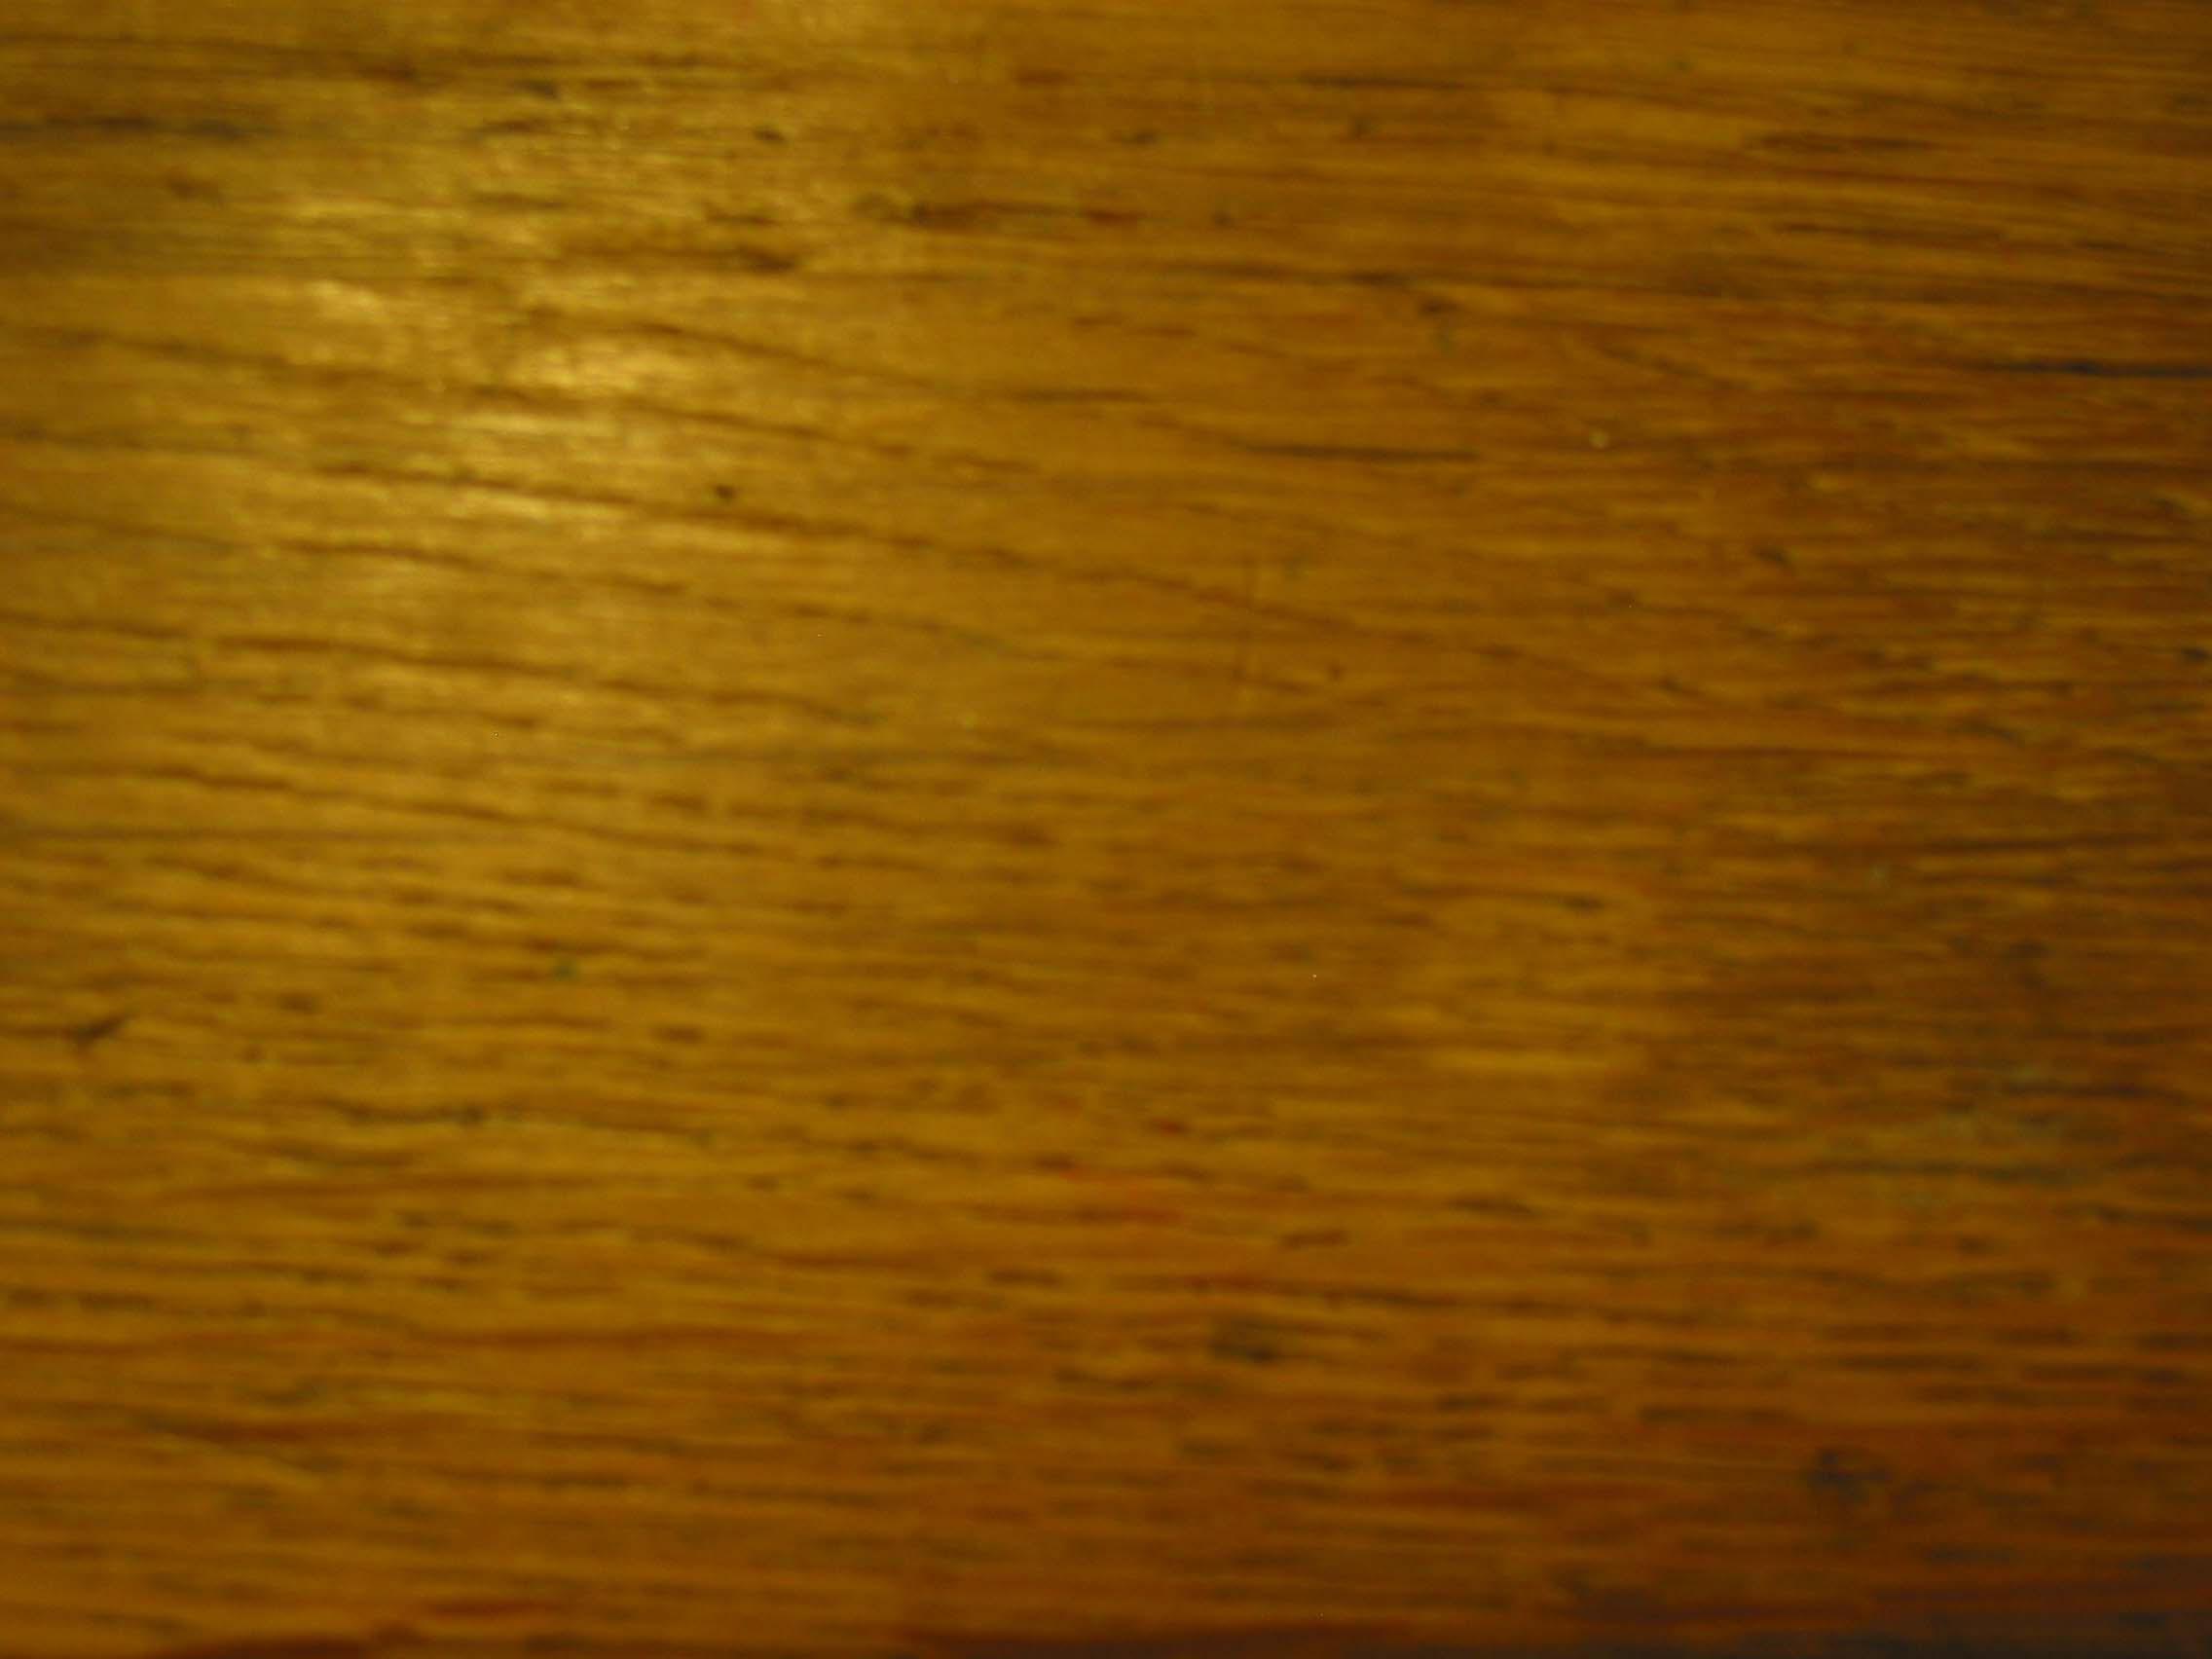 unique wood desk texture pattern plank floor asian o throughout  -  decorating wood desk texture